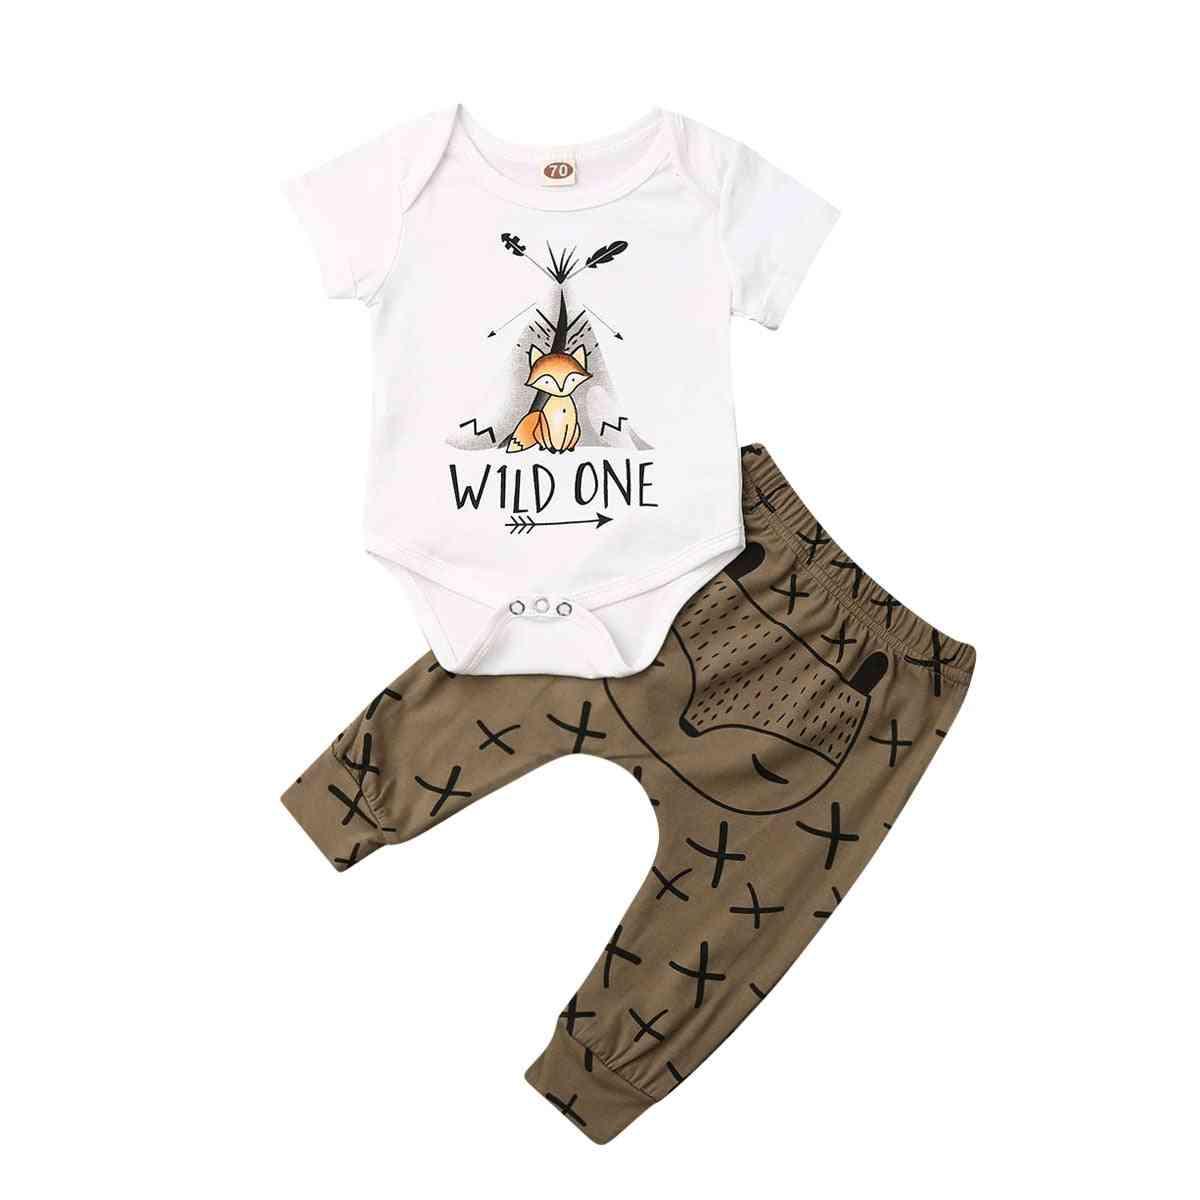 Summer Newborn Baby Boy, Girl Clothes Cartoon Print Short Sleeve Top, Pant